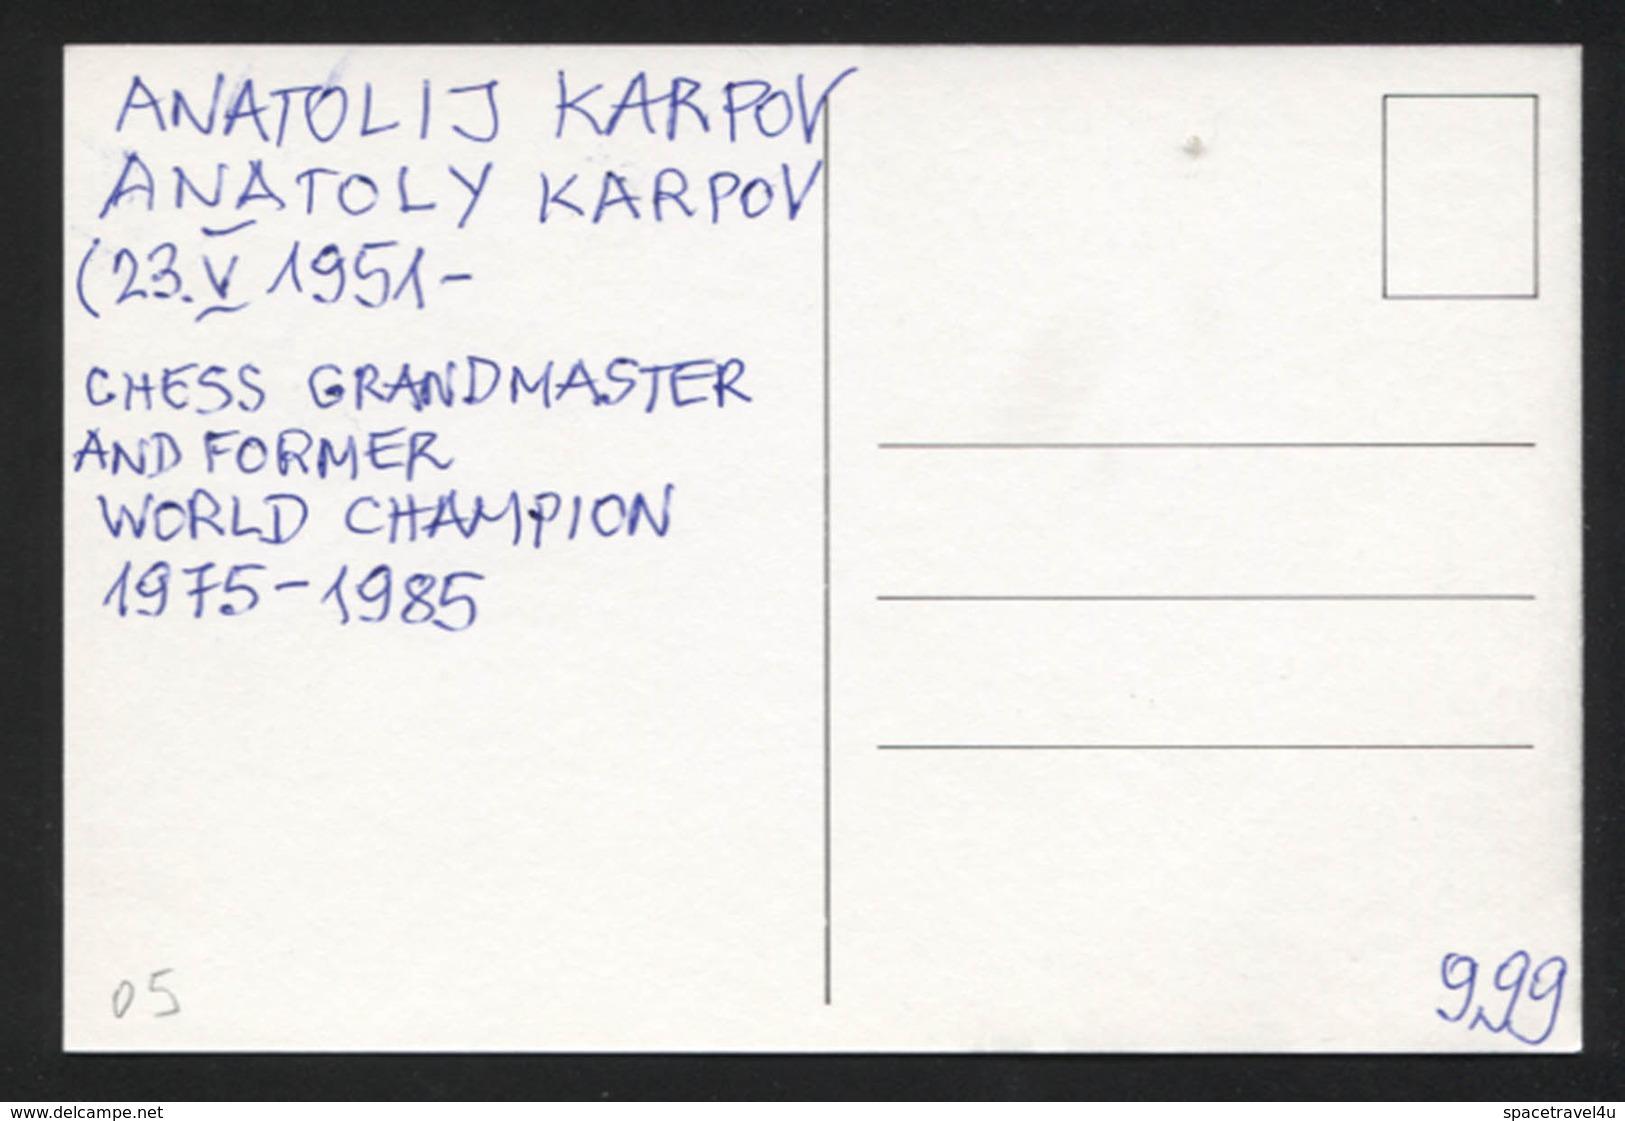 Anatolij Karpov - Russian Chess Grandmaster And Former World Champion -  Postcard - (CHESS-05) - Cartes Postales